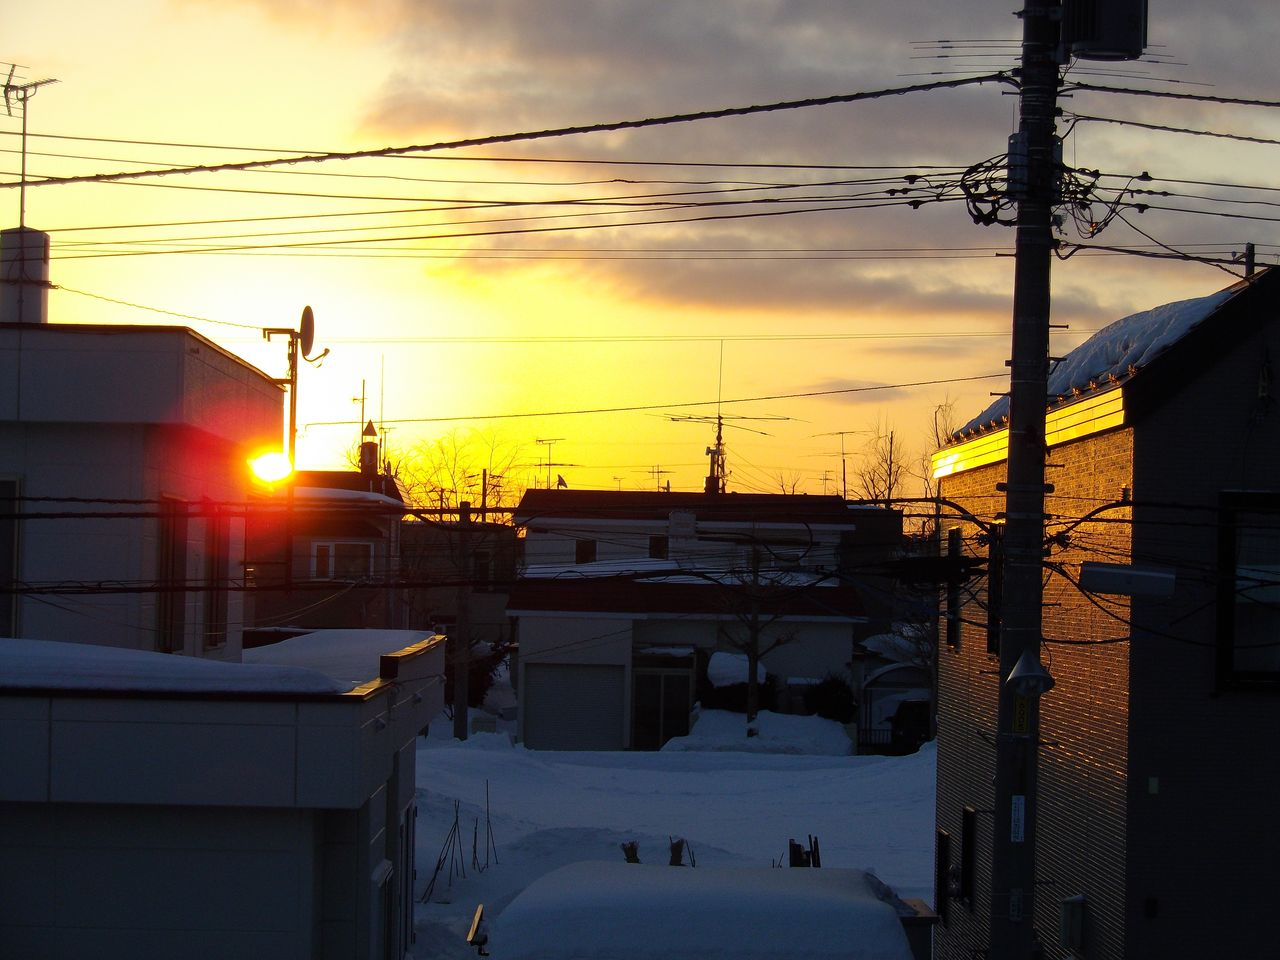 立春寒波:一日某所に幽閉_c0025115_20243765.jpg